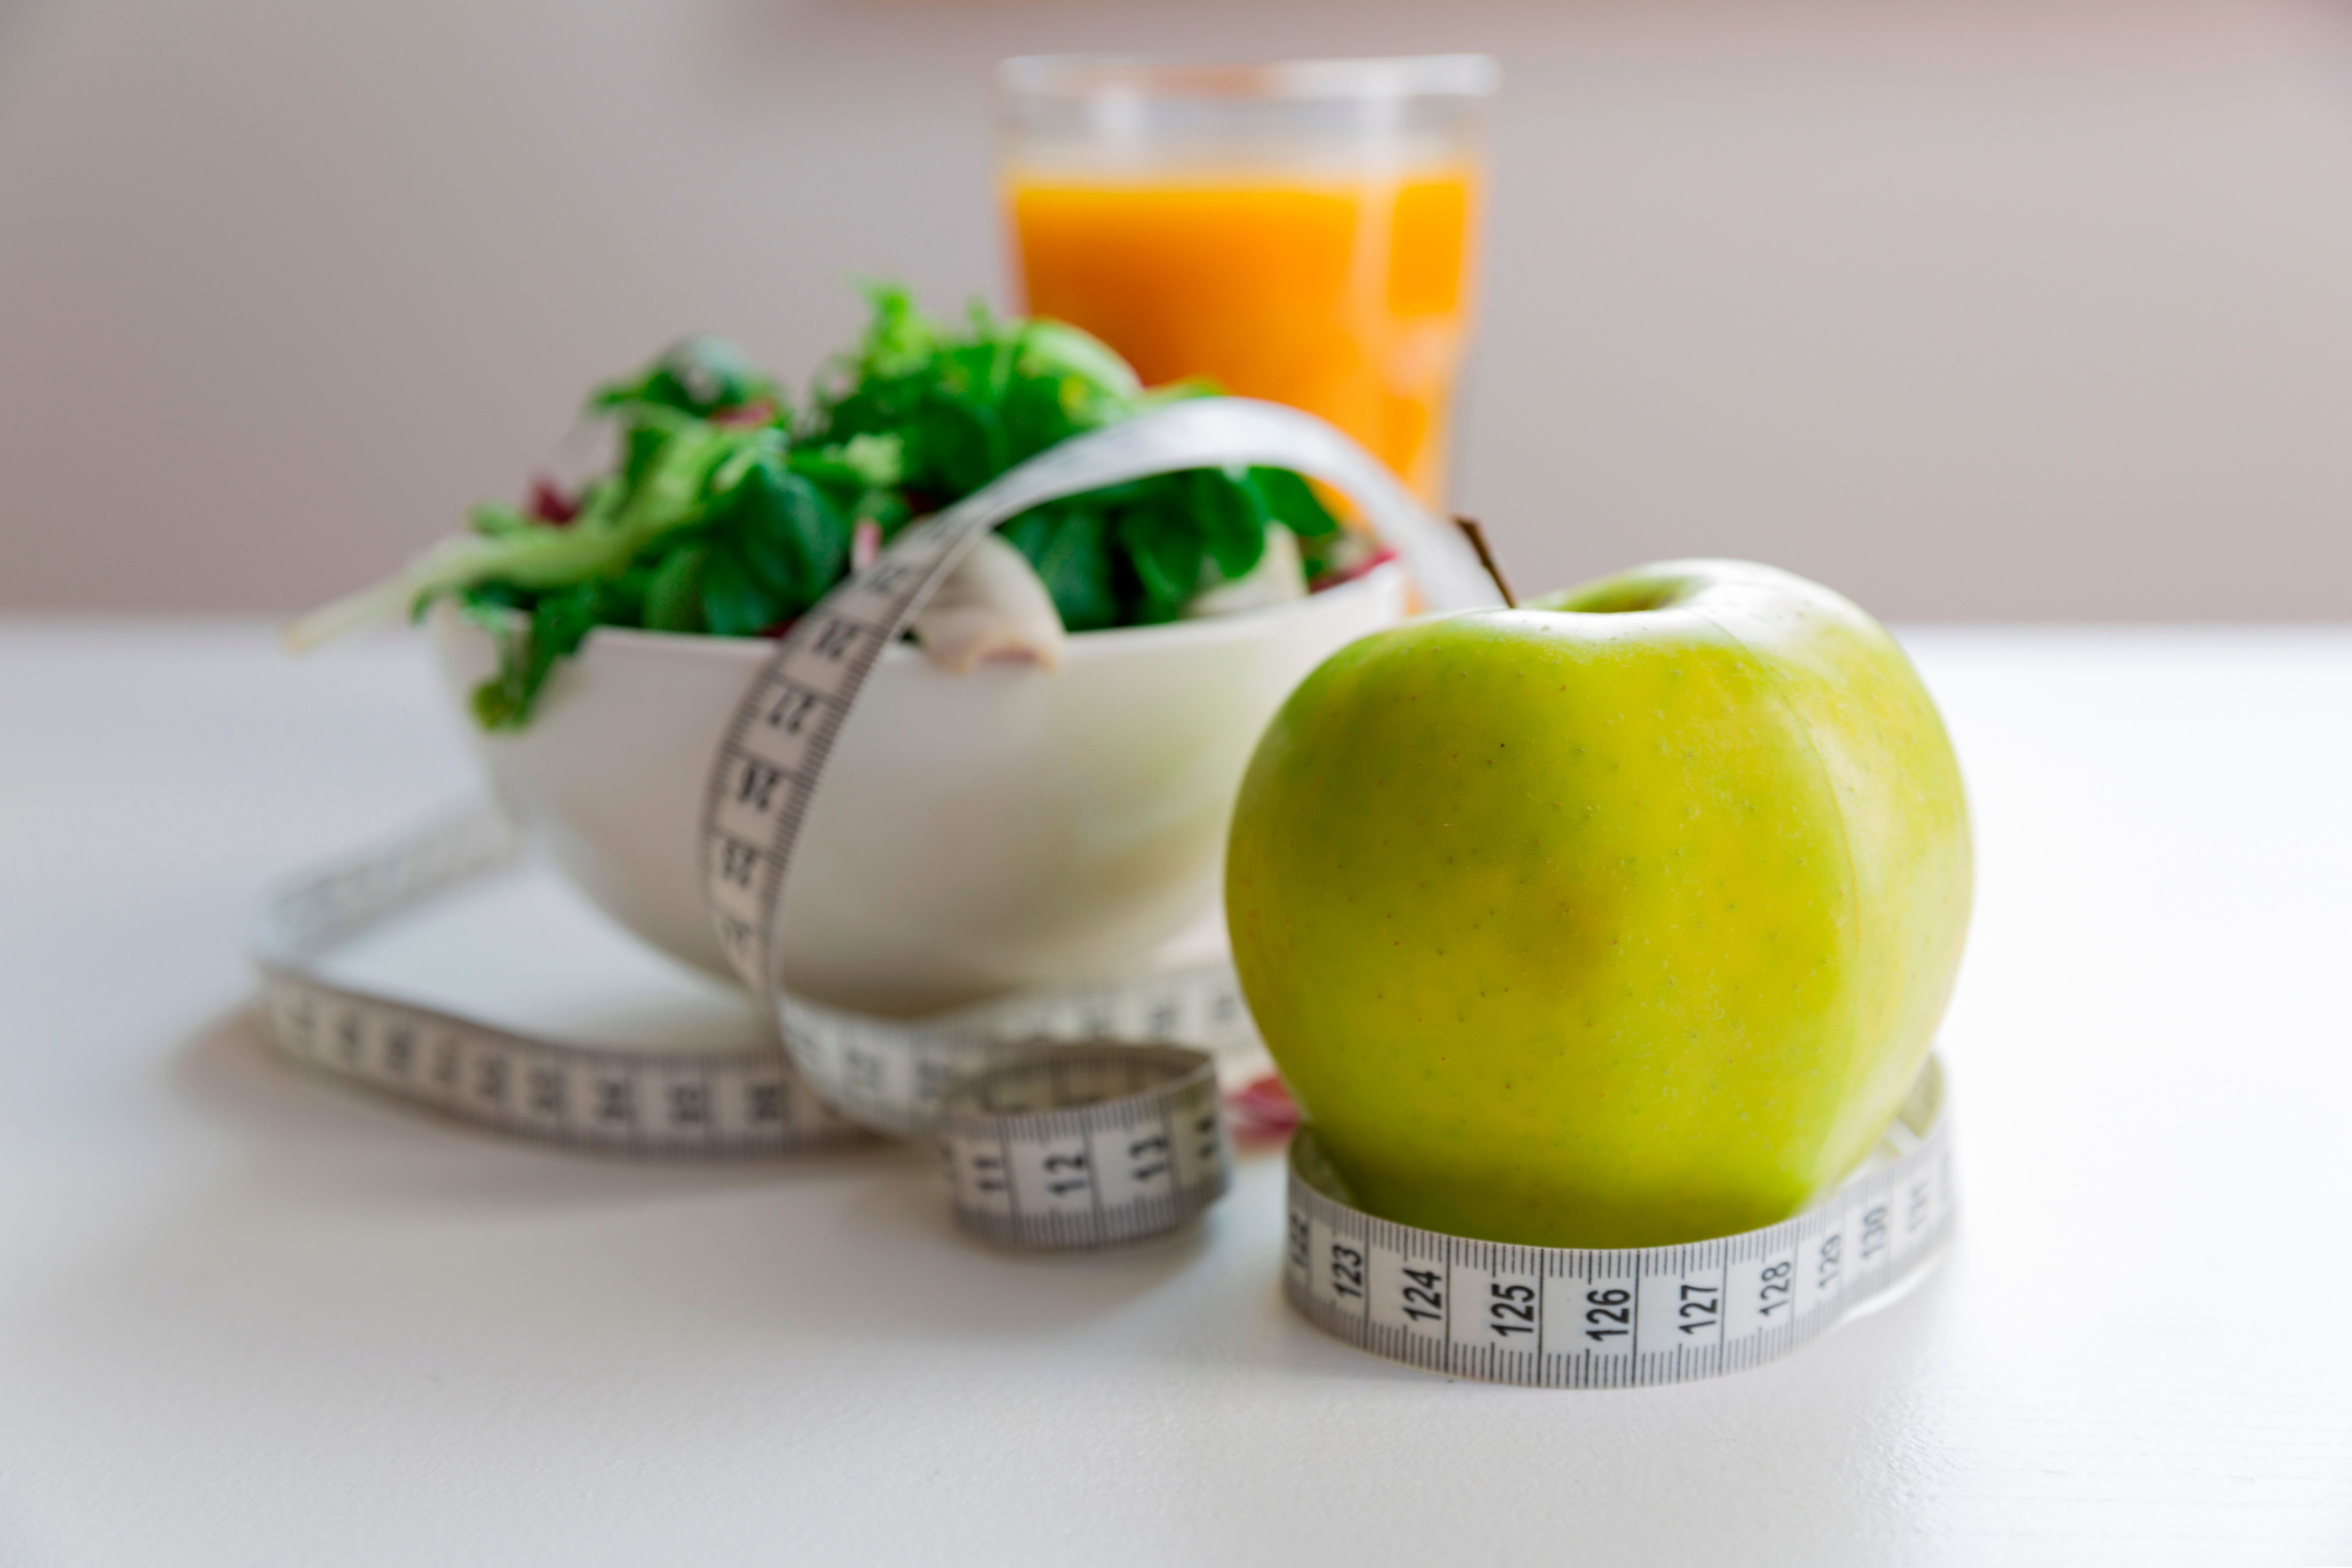 Romina Pereiro - Dietas restrictivas